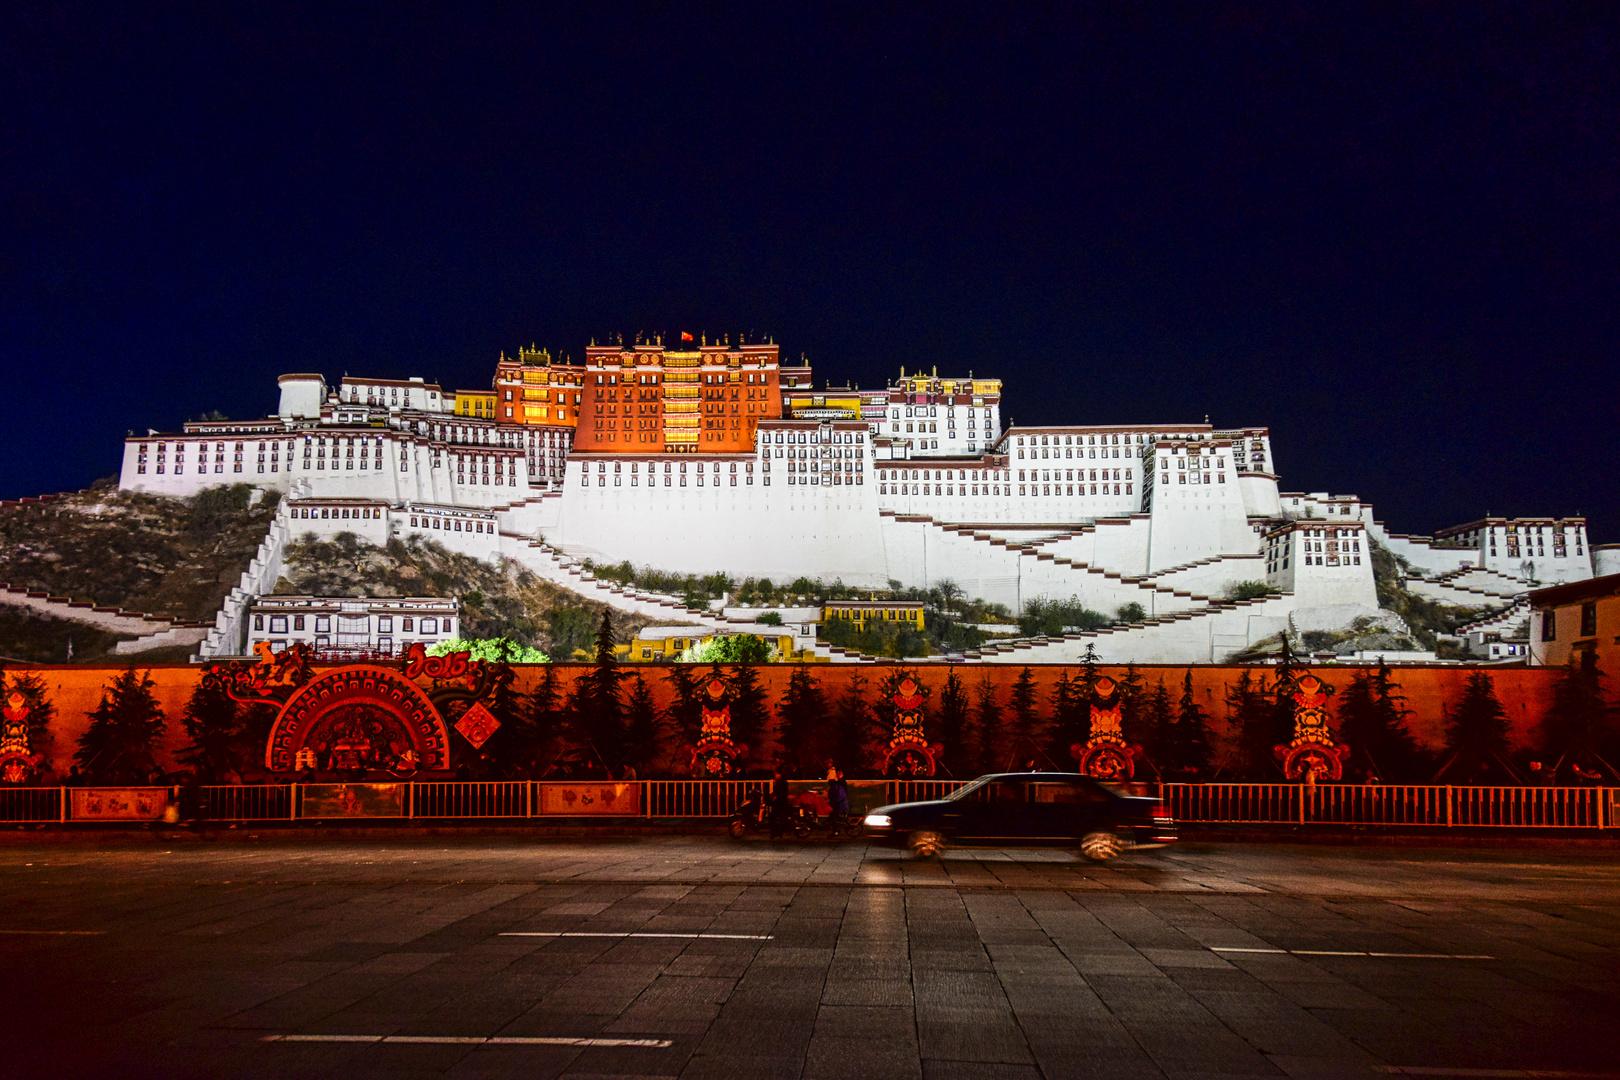 Lhasa, Potalapalast